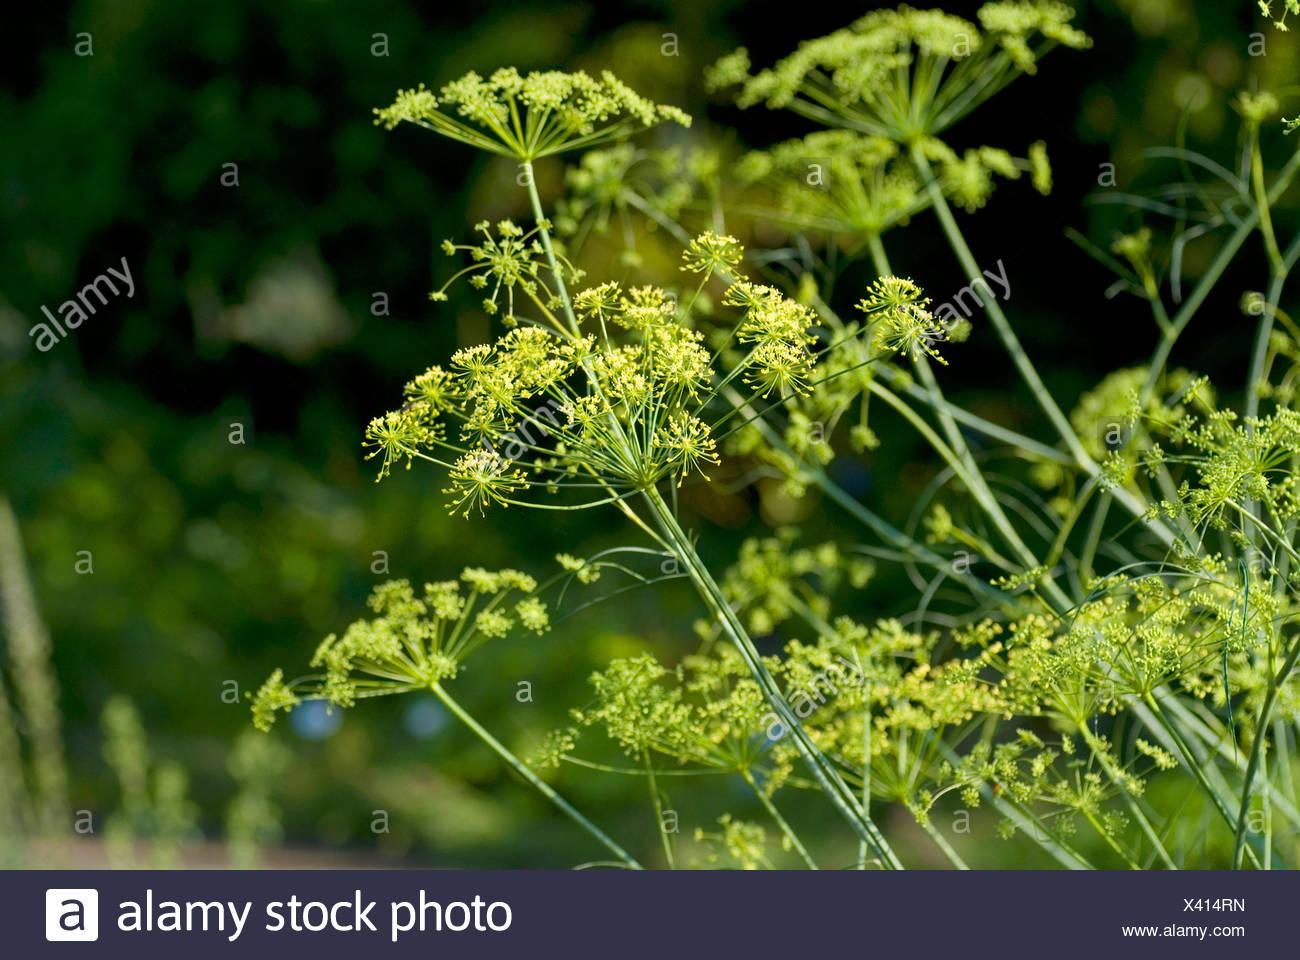 hog's fennel (Peucedanum officinale), blooming, Germany - Stock Image